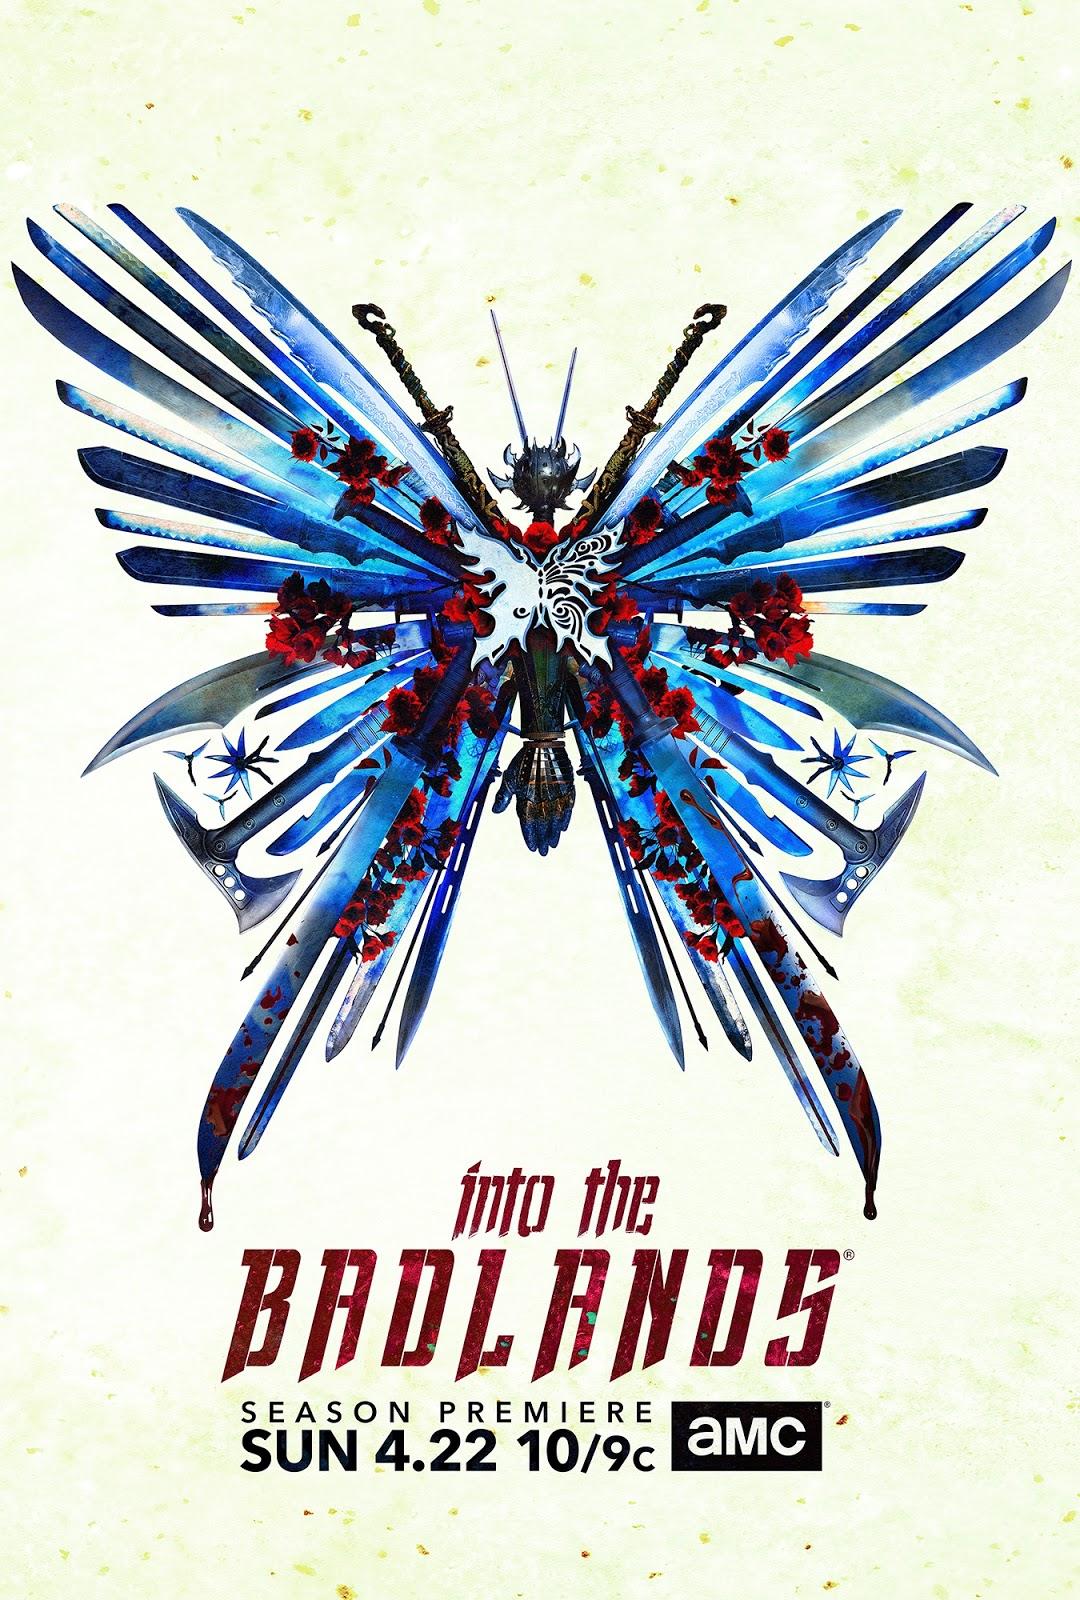 Into the Badlands 2018: Season 3 - Full (1/16)